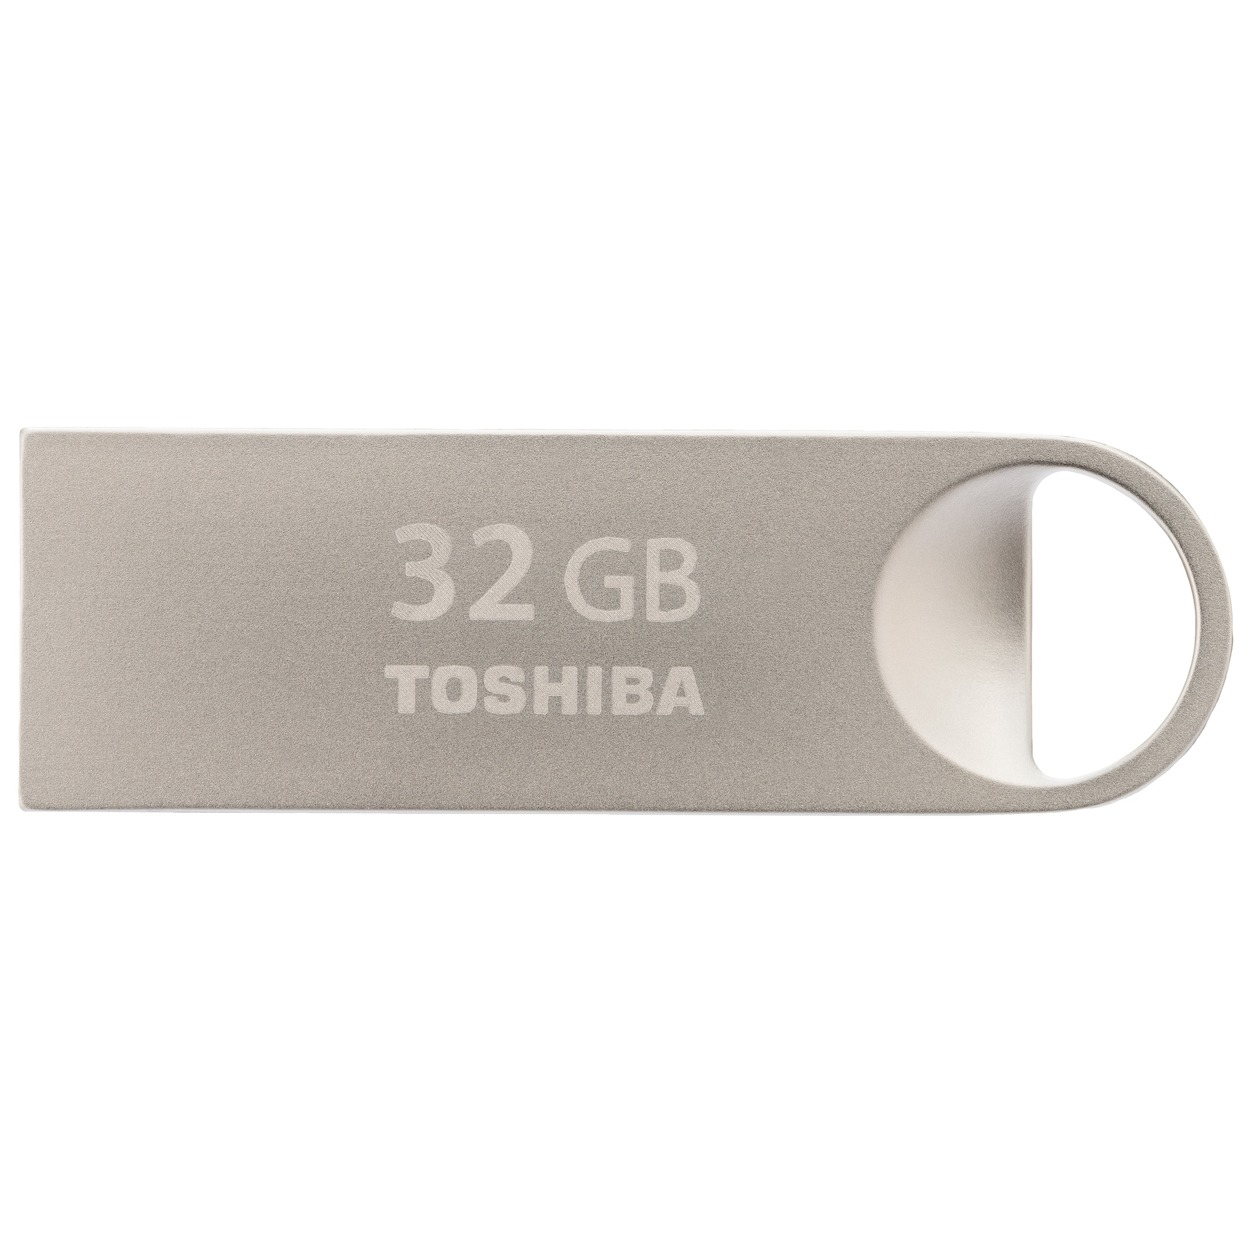 Toshiba TransMemory U401 32GB USB 2.0 zilver